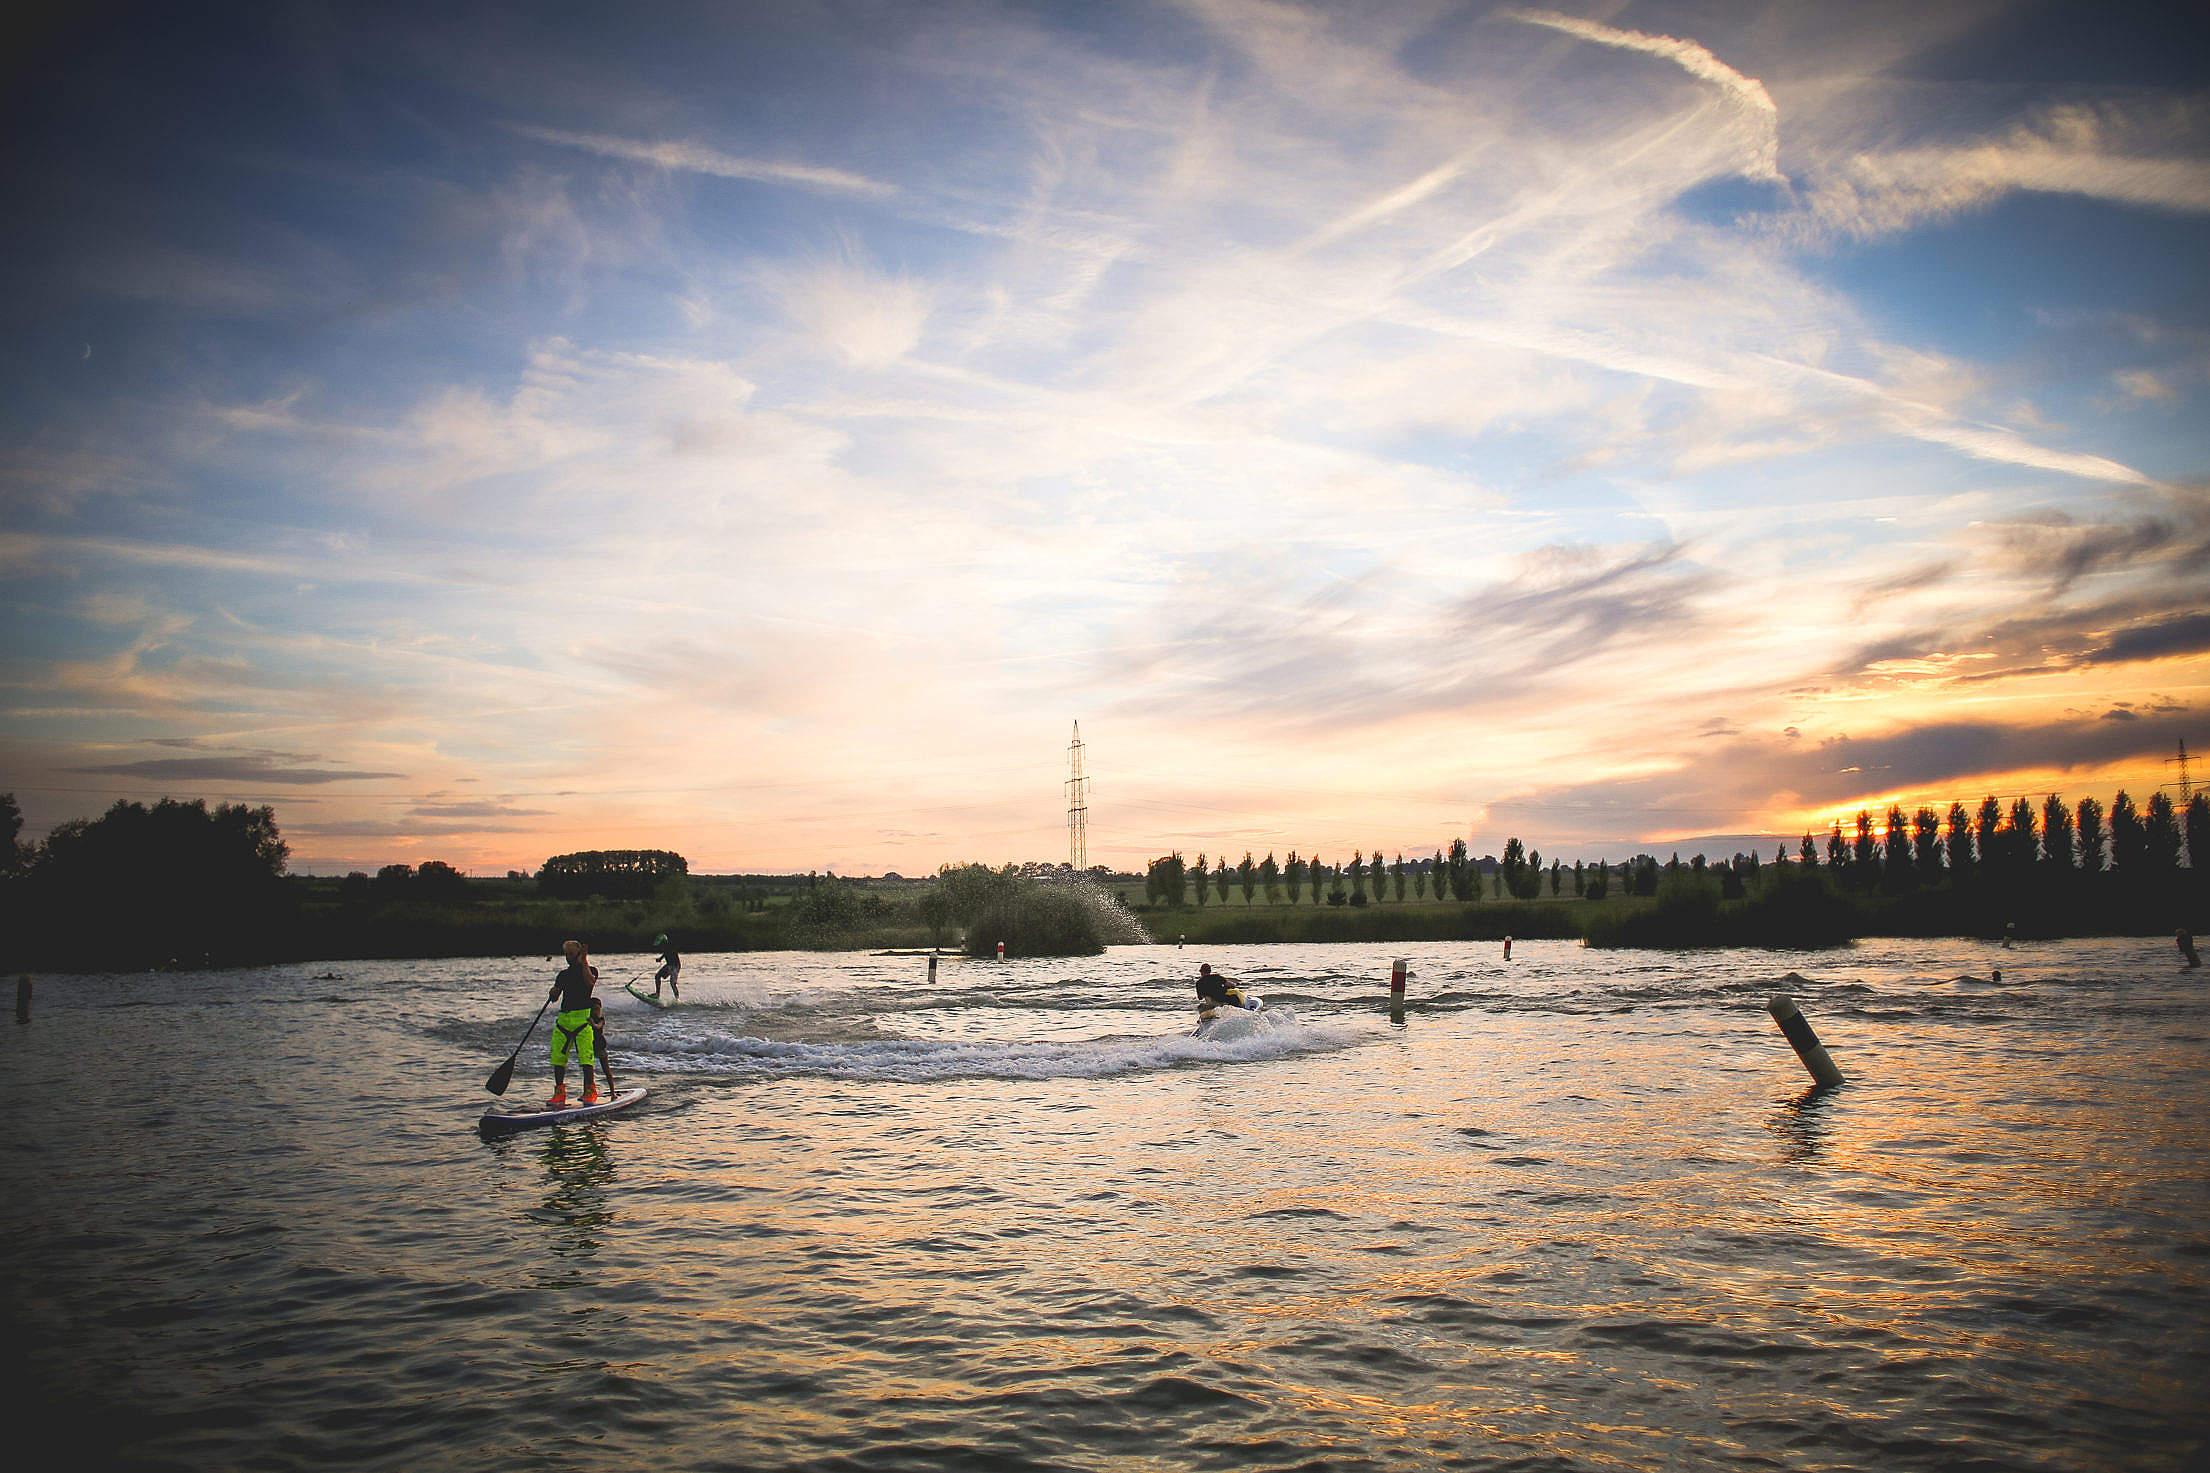 JetSurf Watersports Sunset Free Stock Photo